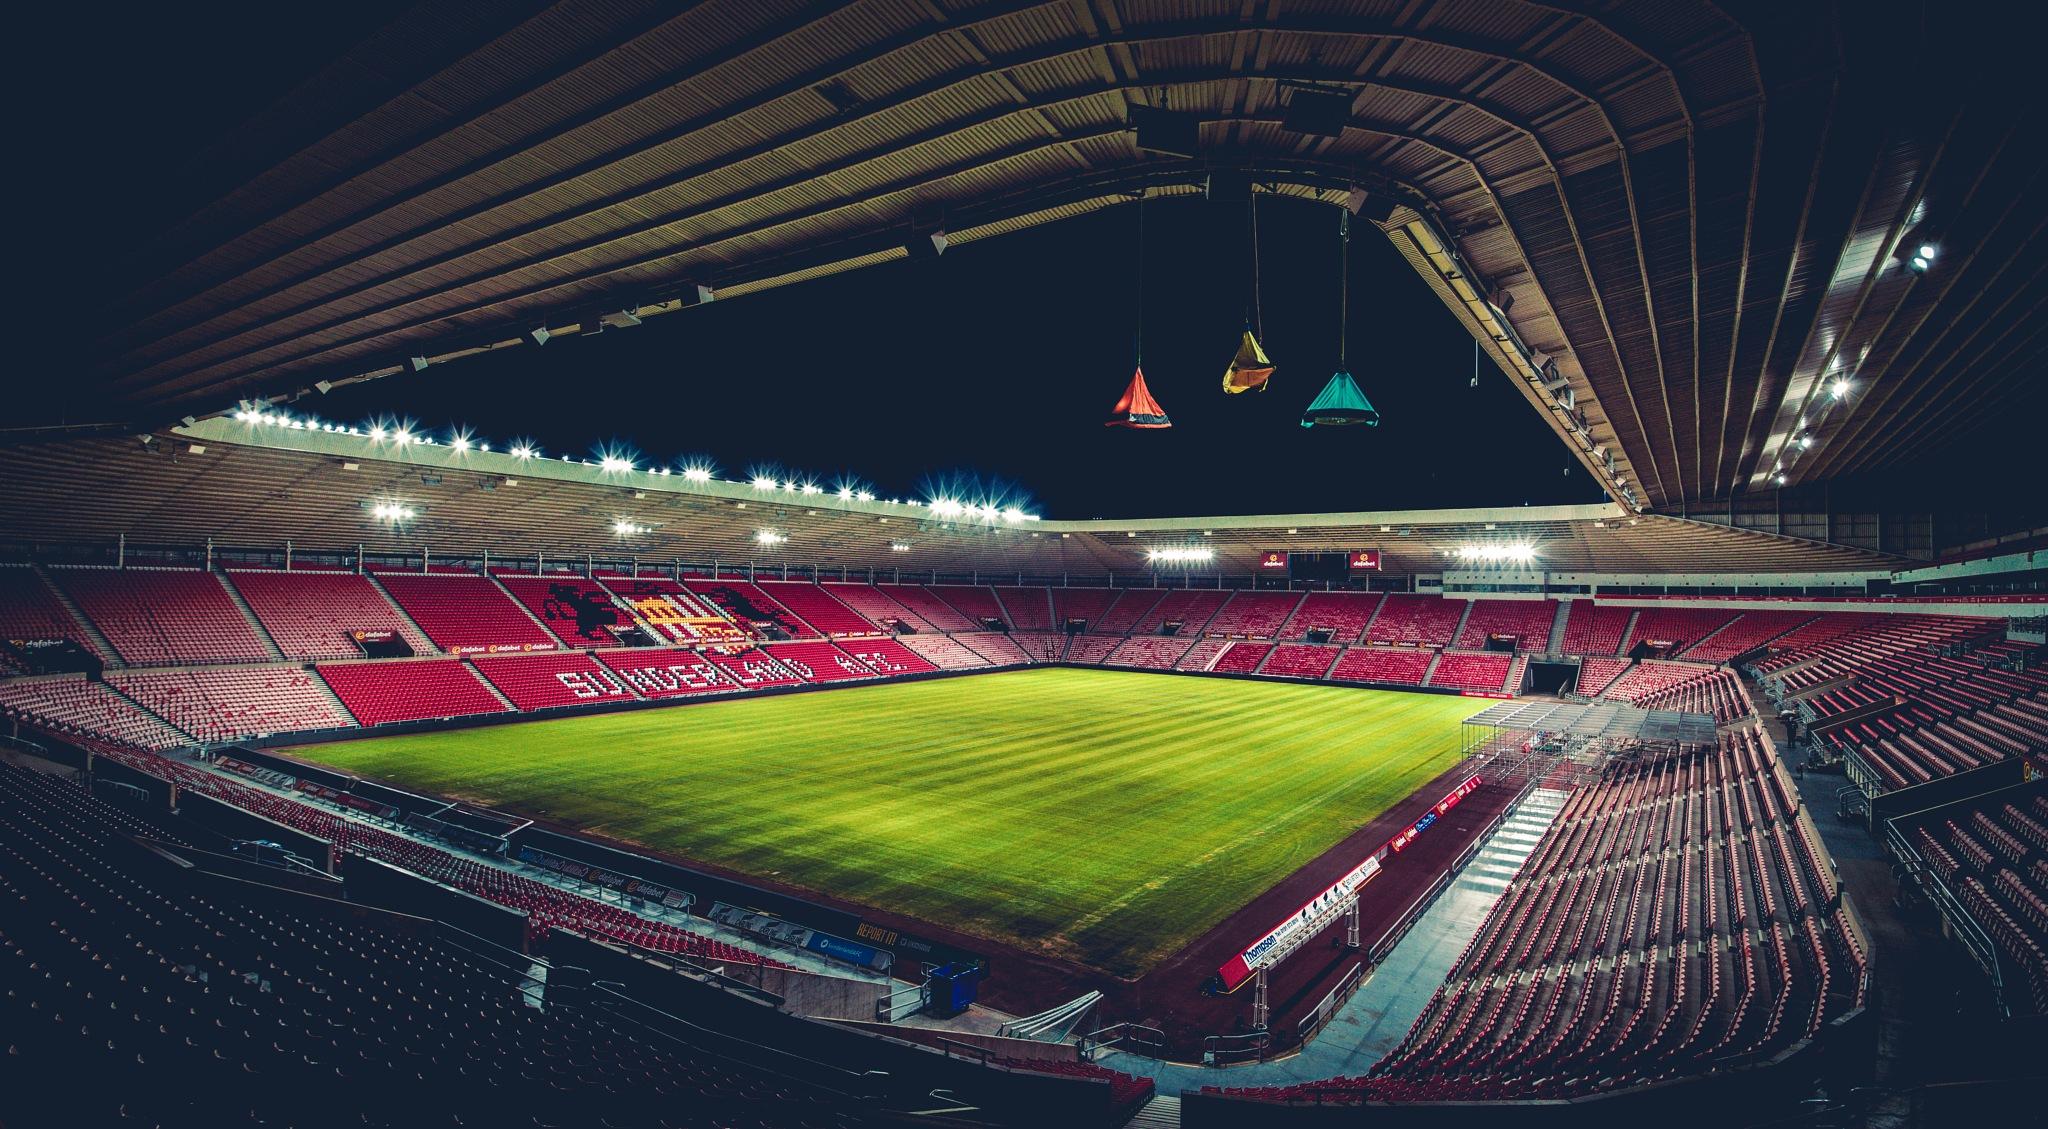 Photo in Journalism #sunderland #football #portaledge #sleeping #charity #stadium #centrepoint #floodlights #pitch #seating #nighttime #extreme #climbing